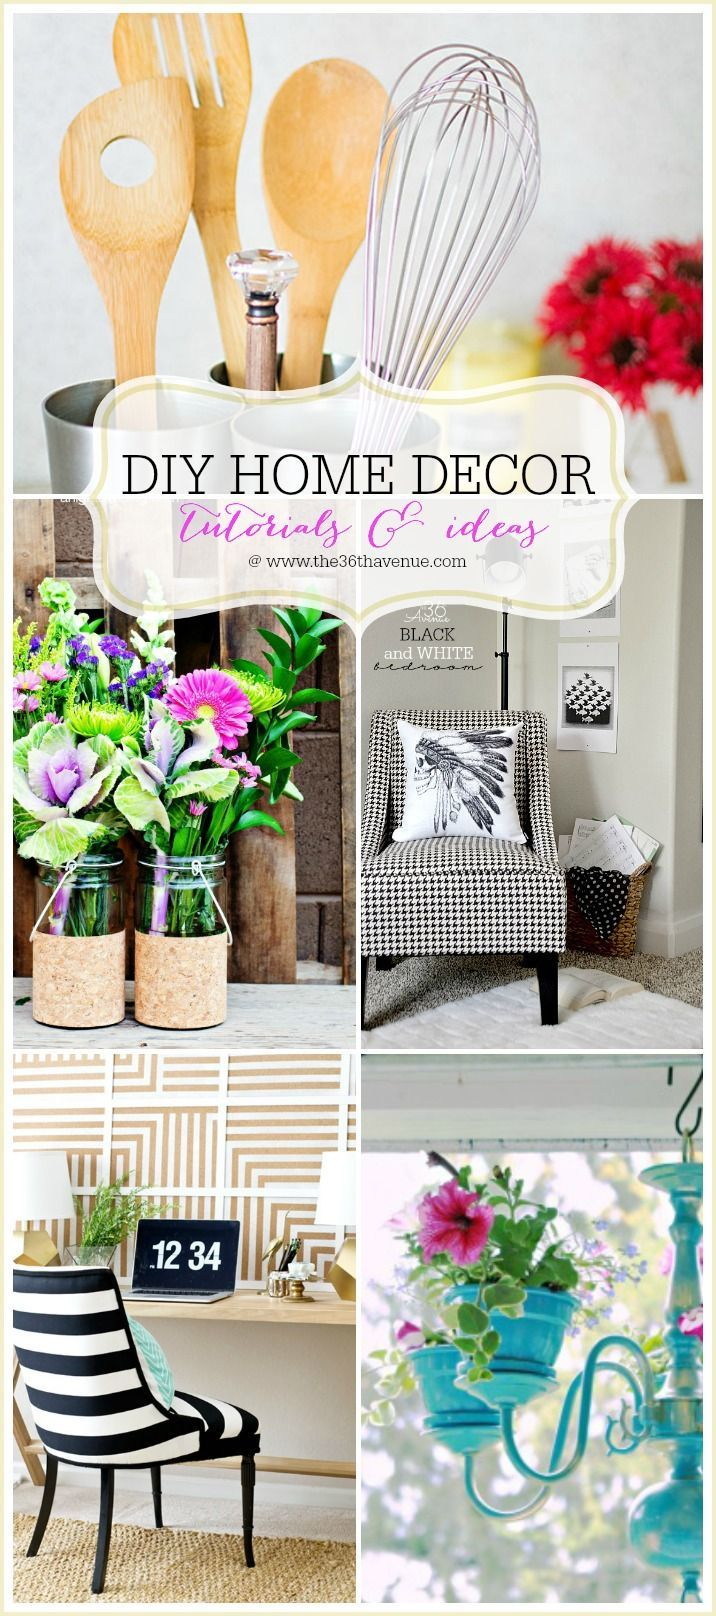 Home Decor DIY Projects Diy home decor, Diy house